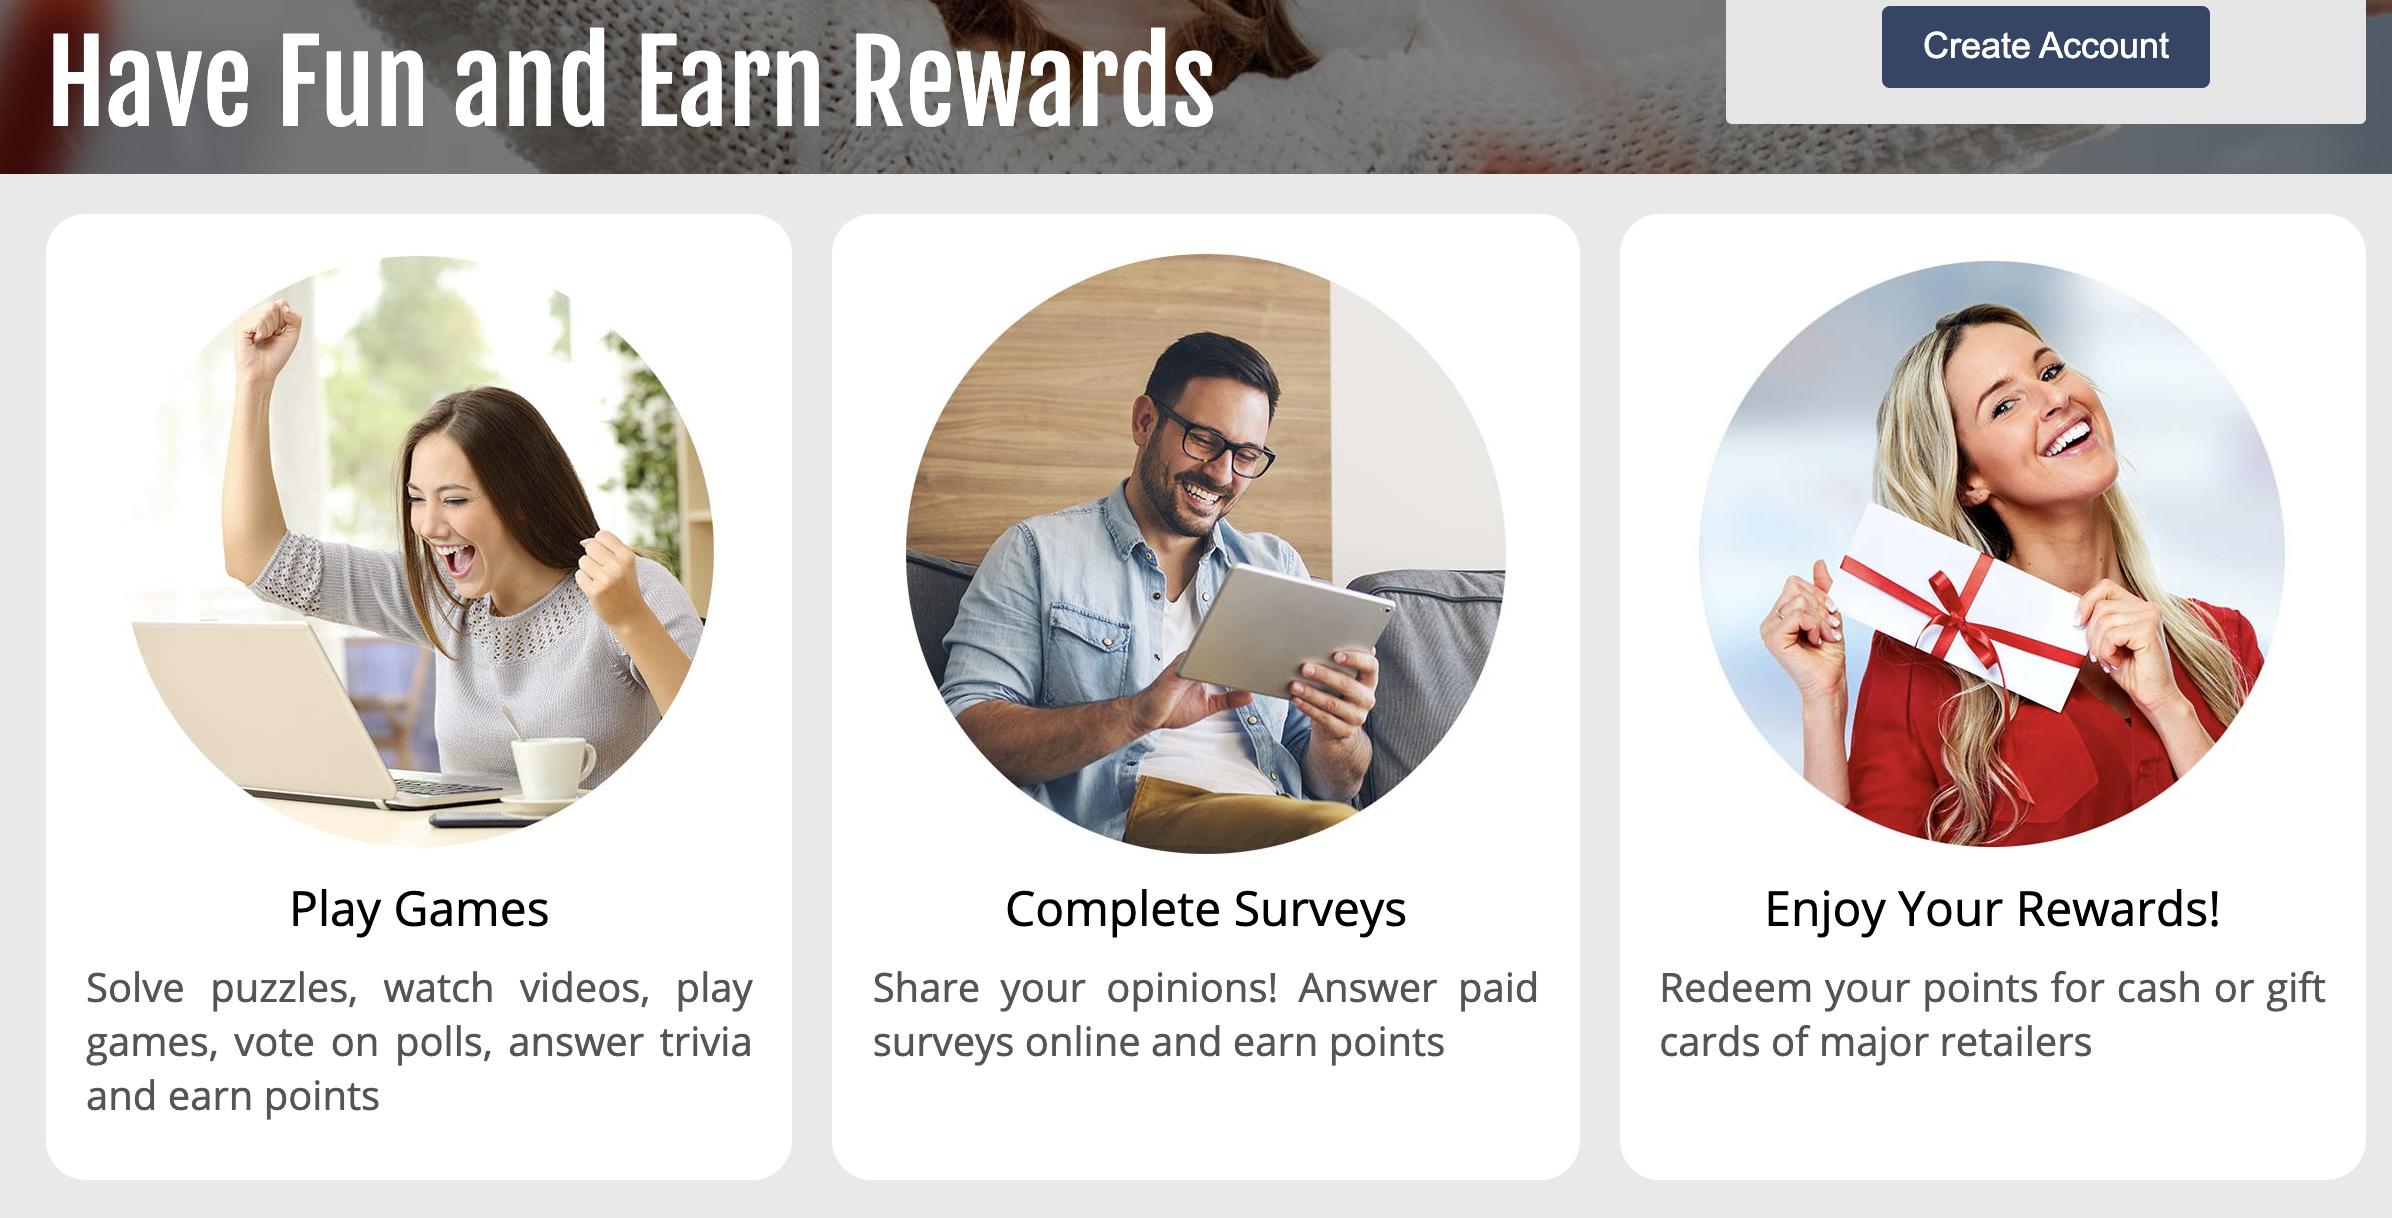 have fun and earn rewards with rewardia